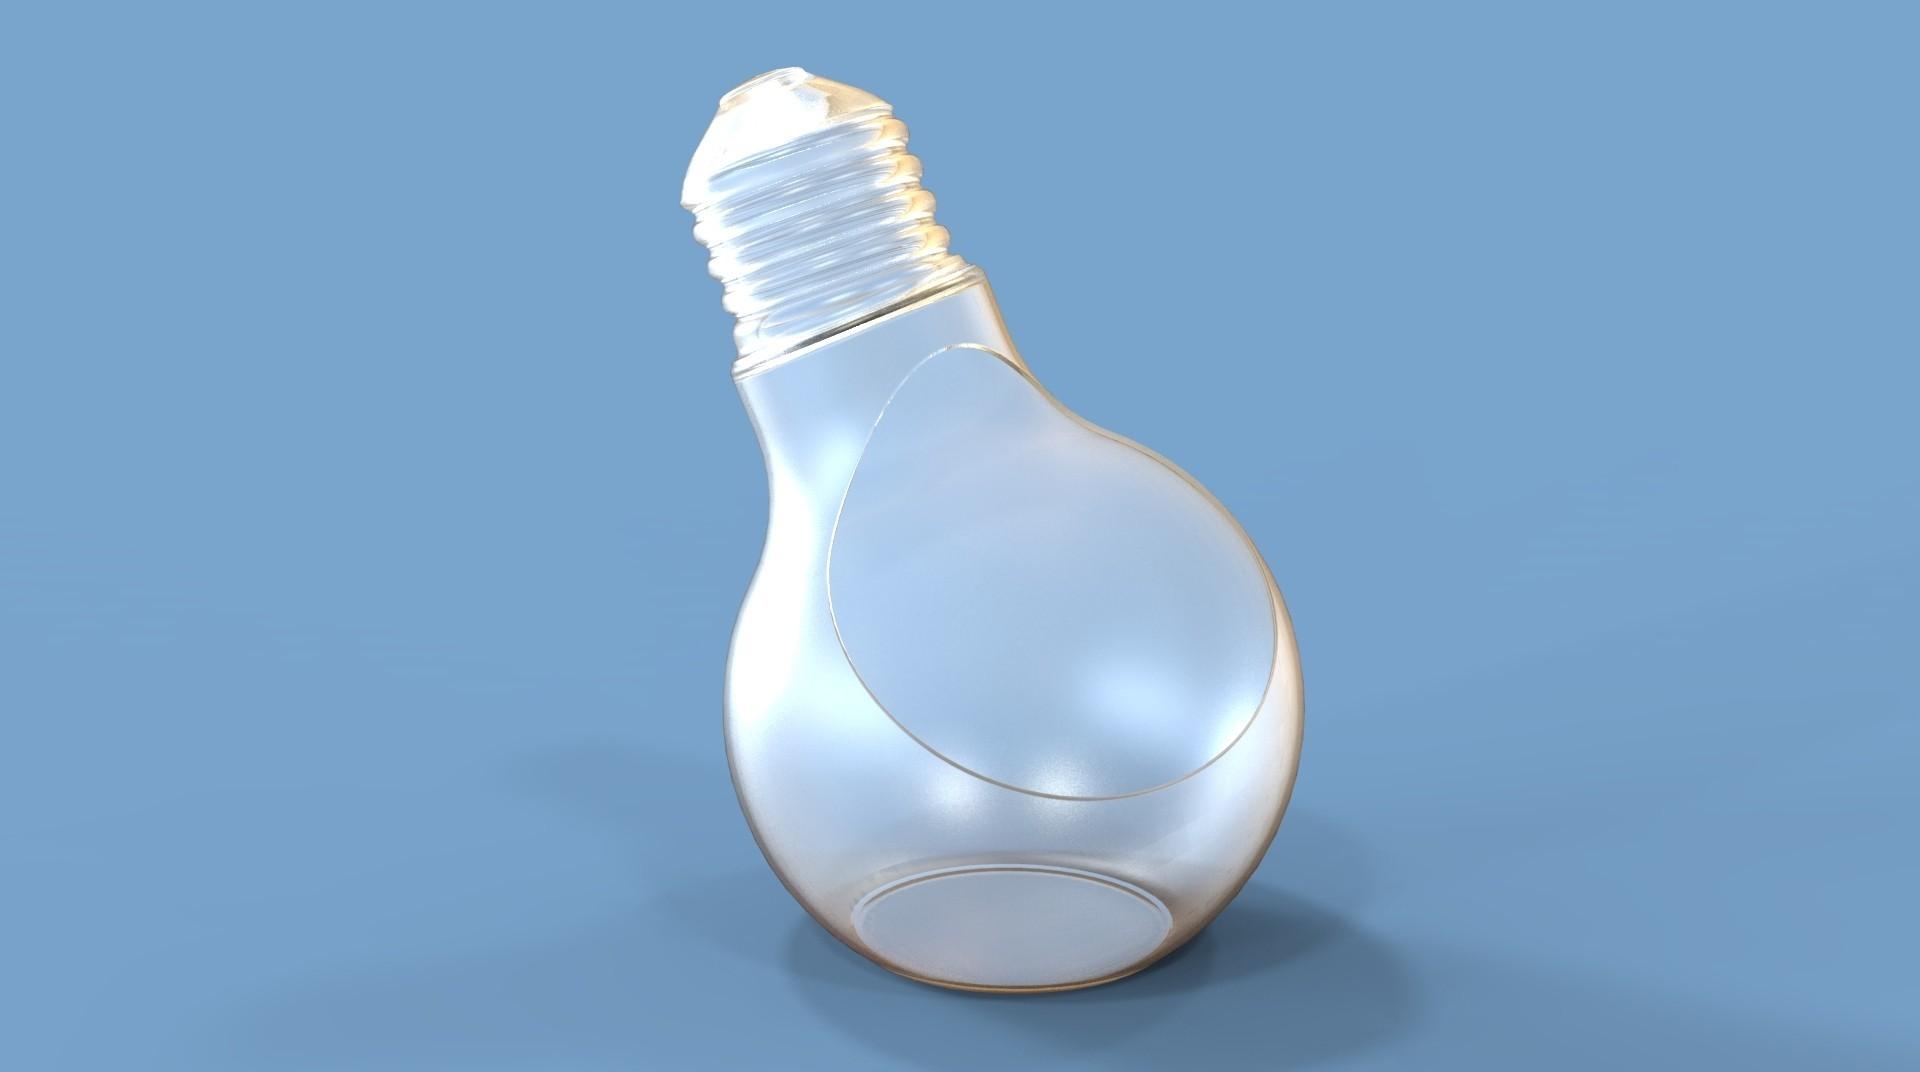 untitled.147.jpg Download STL file Bulb Pot • 3D printable design, Dekro